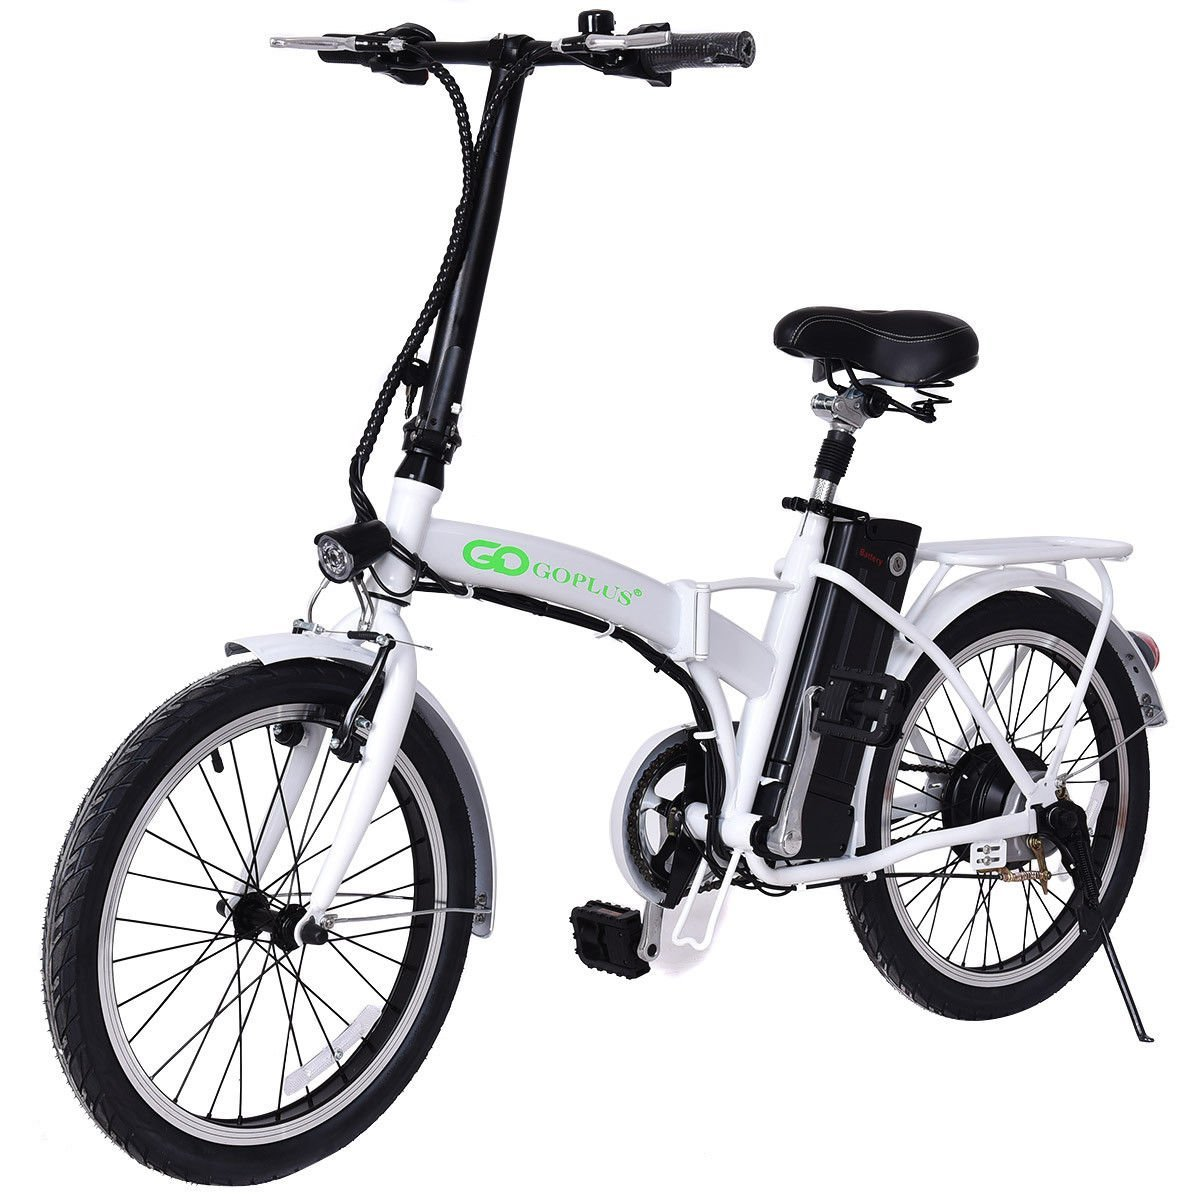 goplus 20 250w folding electric bike gearscoot. Black Bedroom Furniture Sets. Home Design Ideas